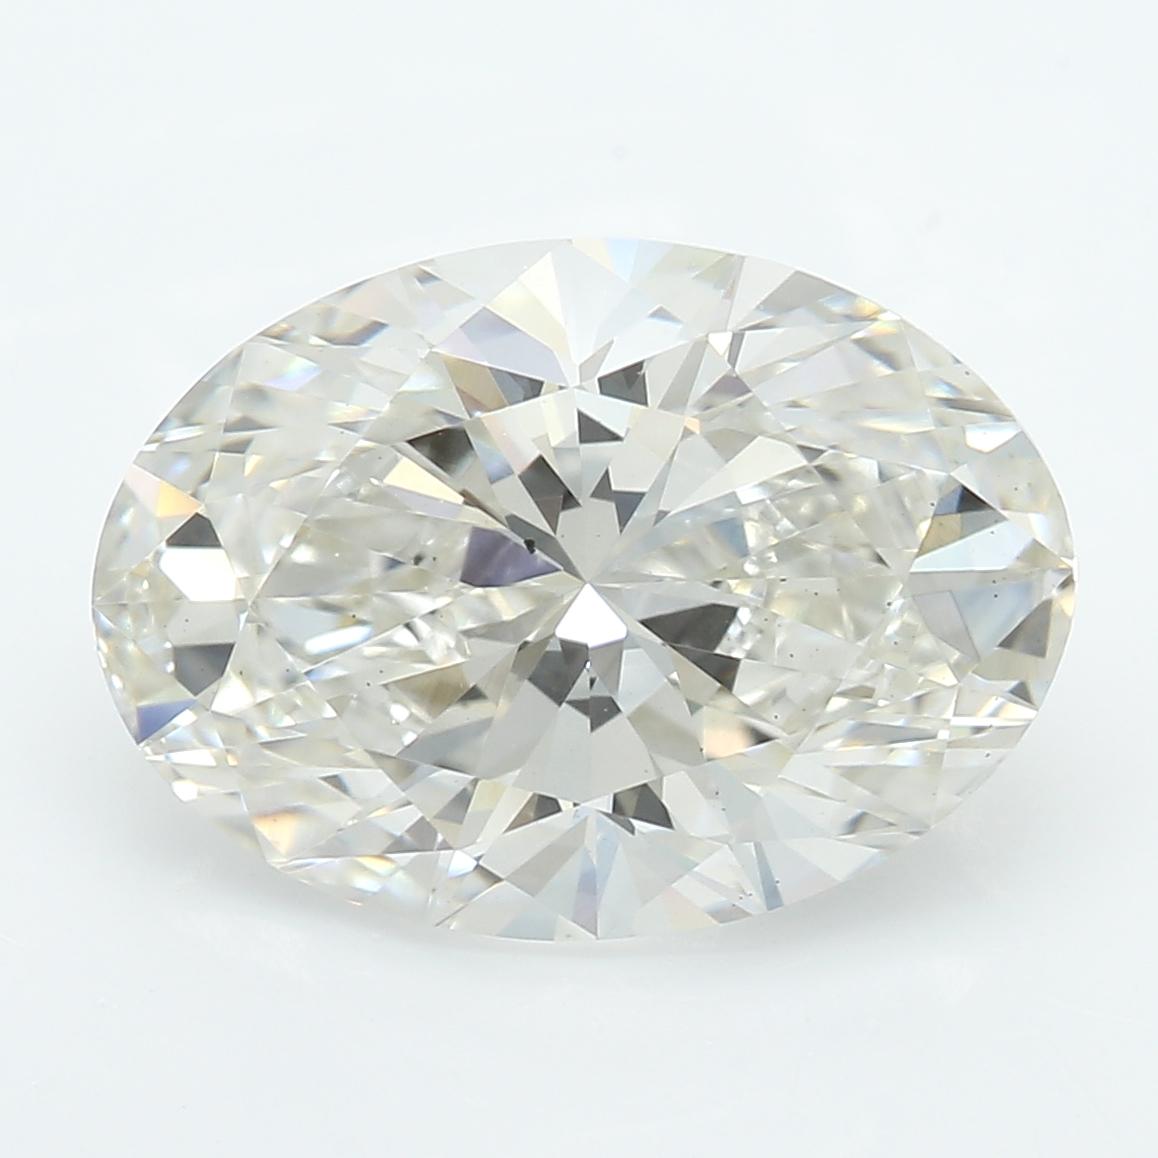 2.54 Carat I-VS2 Excellent Oval Diamond